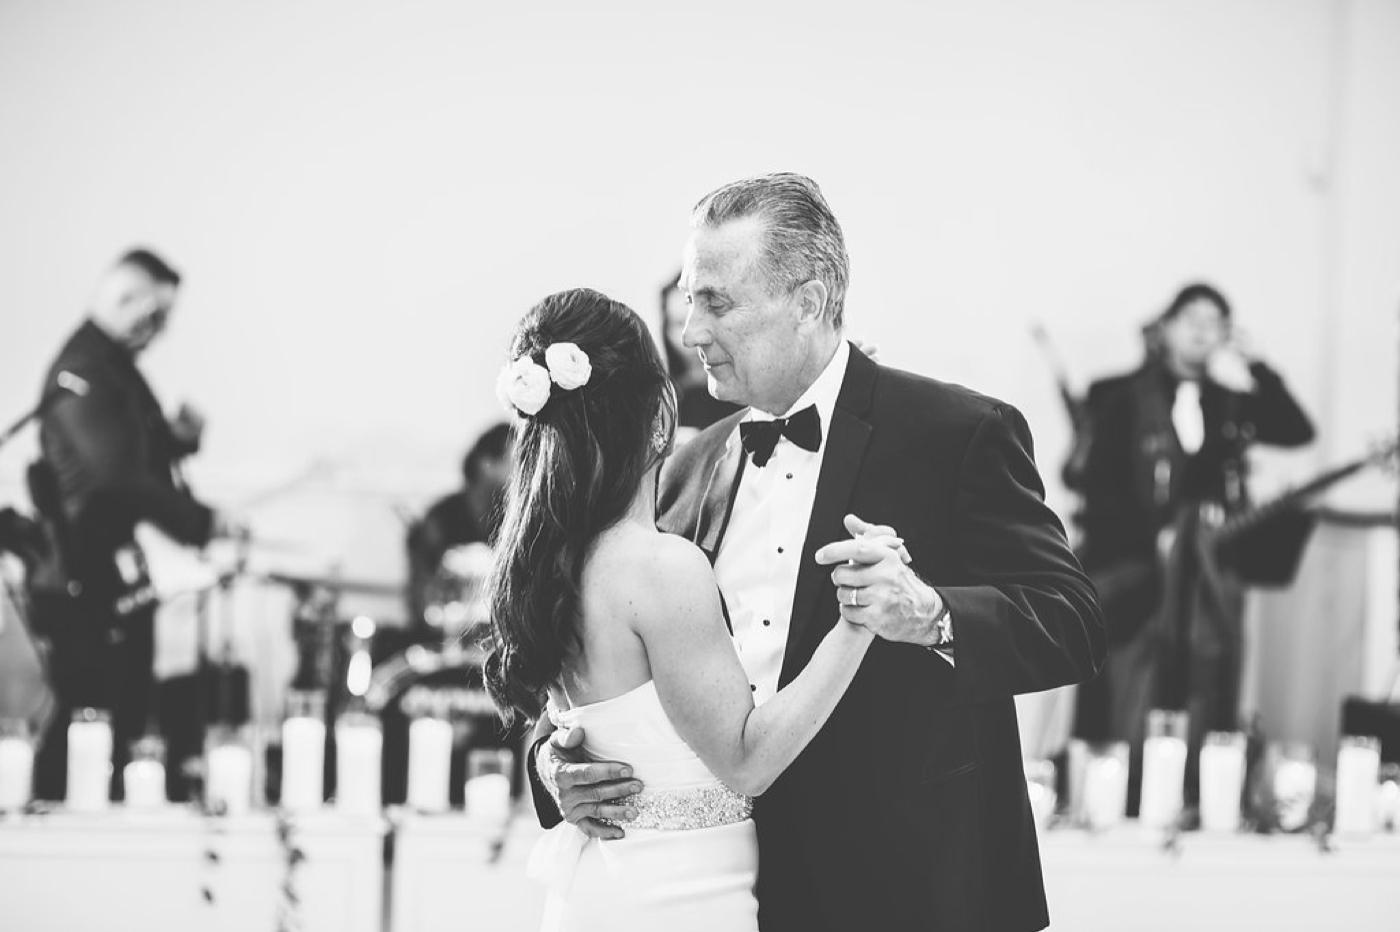 chicago-fine-art-wedding-photography-sakamuri93